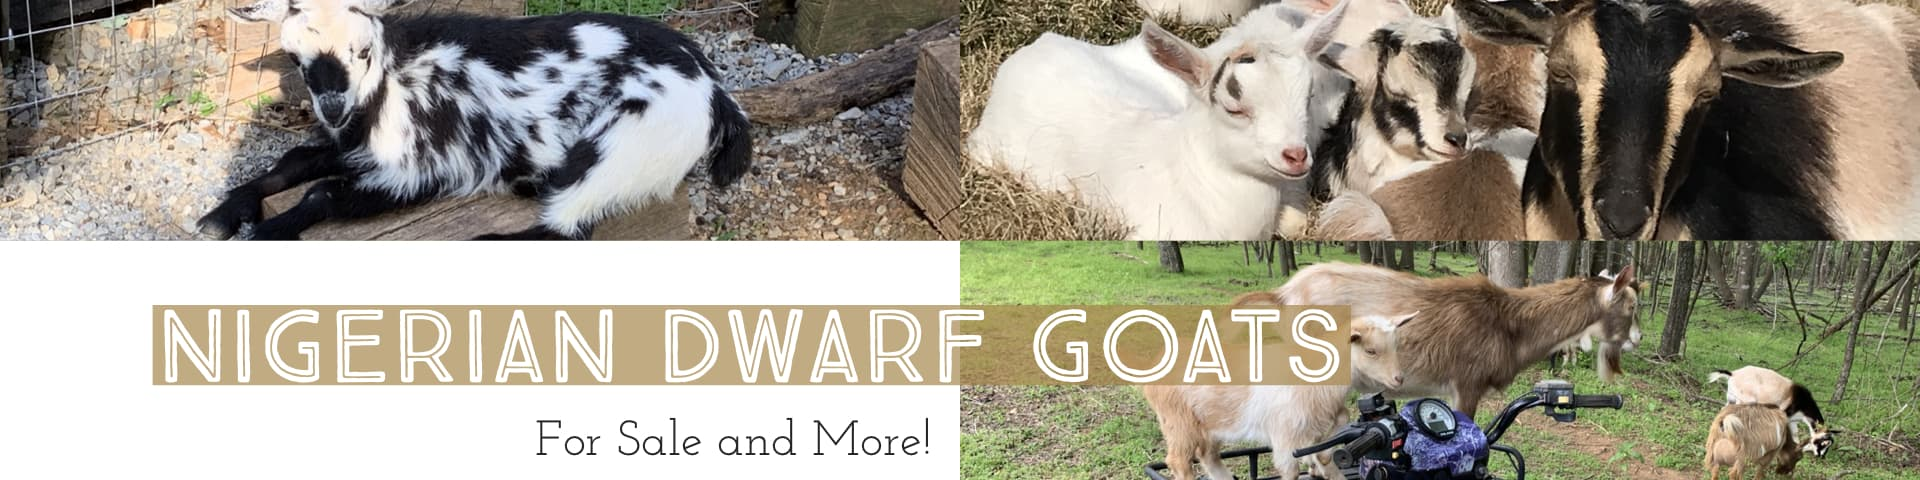 Seven Gables Farm Nigerian Dwarf Goat Banner